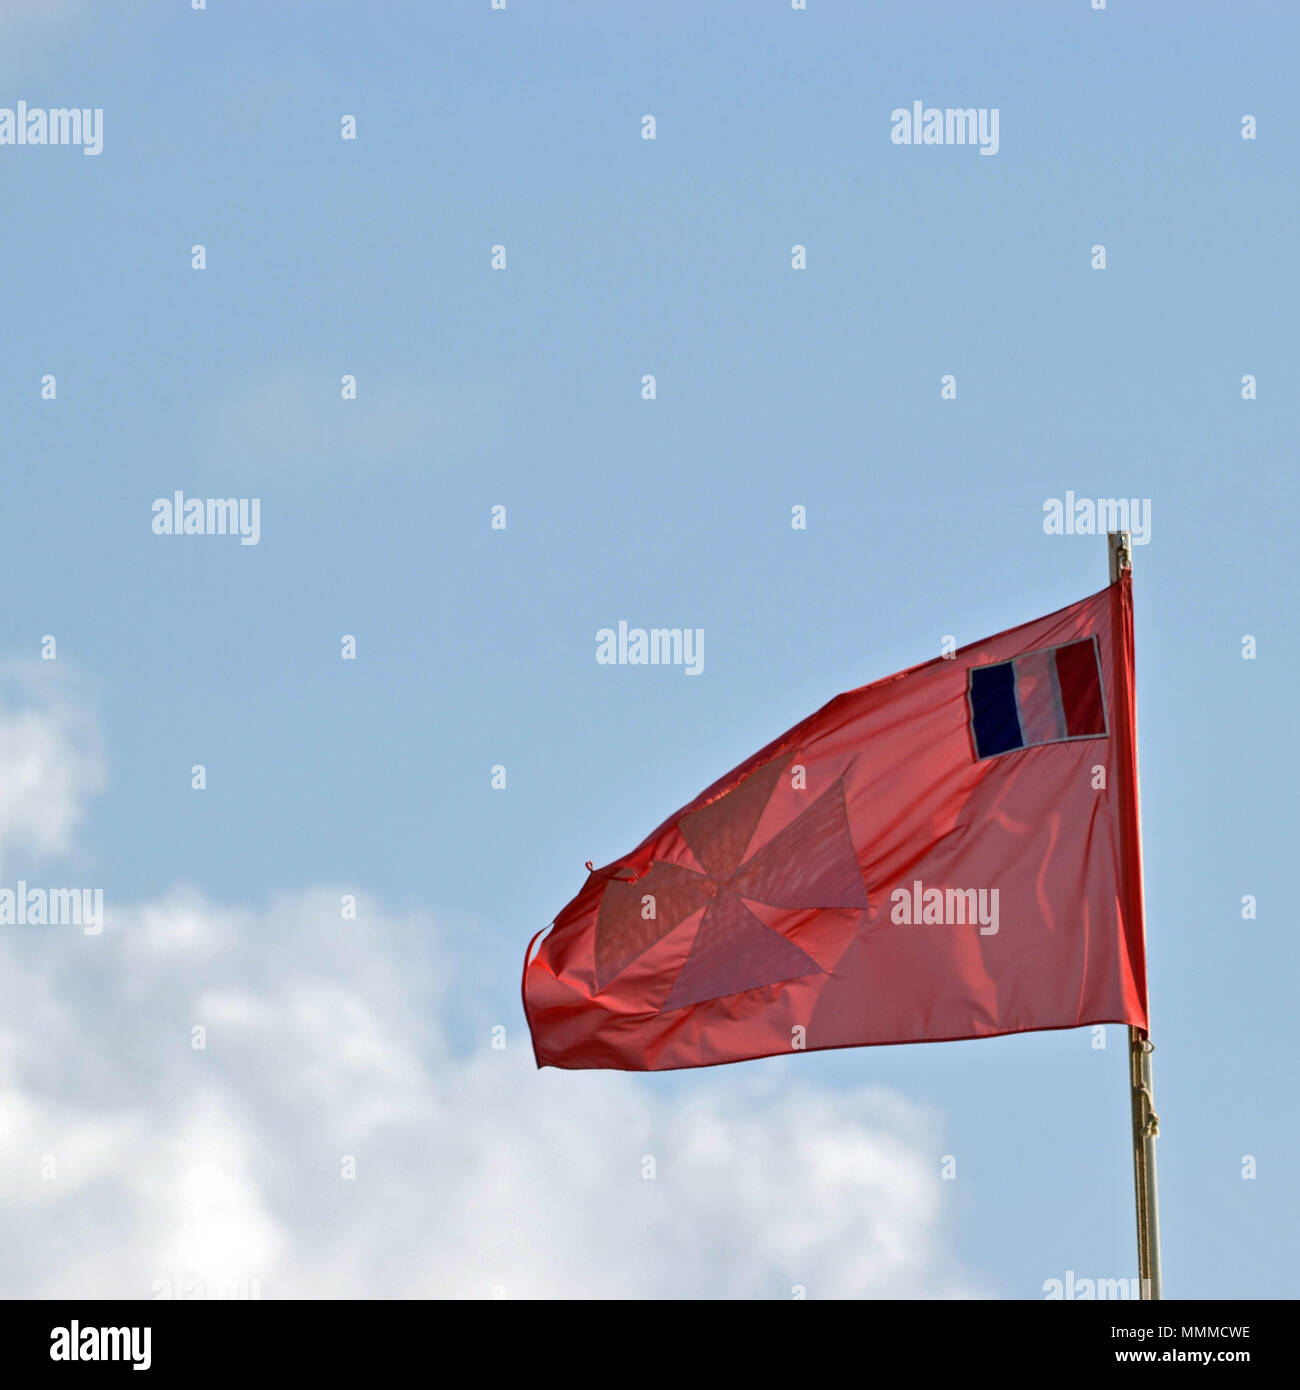 Flag of Wallis & Futuna, Wallis Island, Wallis & Futuna, South Pacific - Stock Image